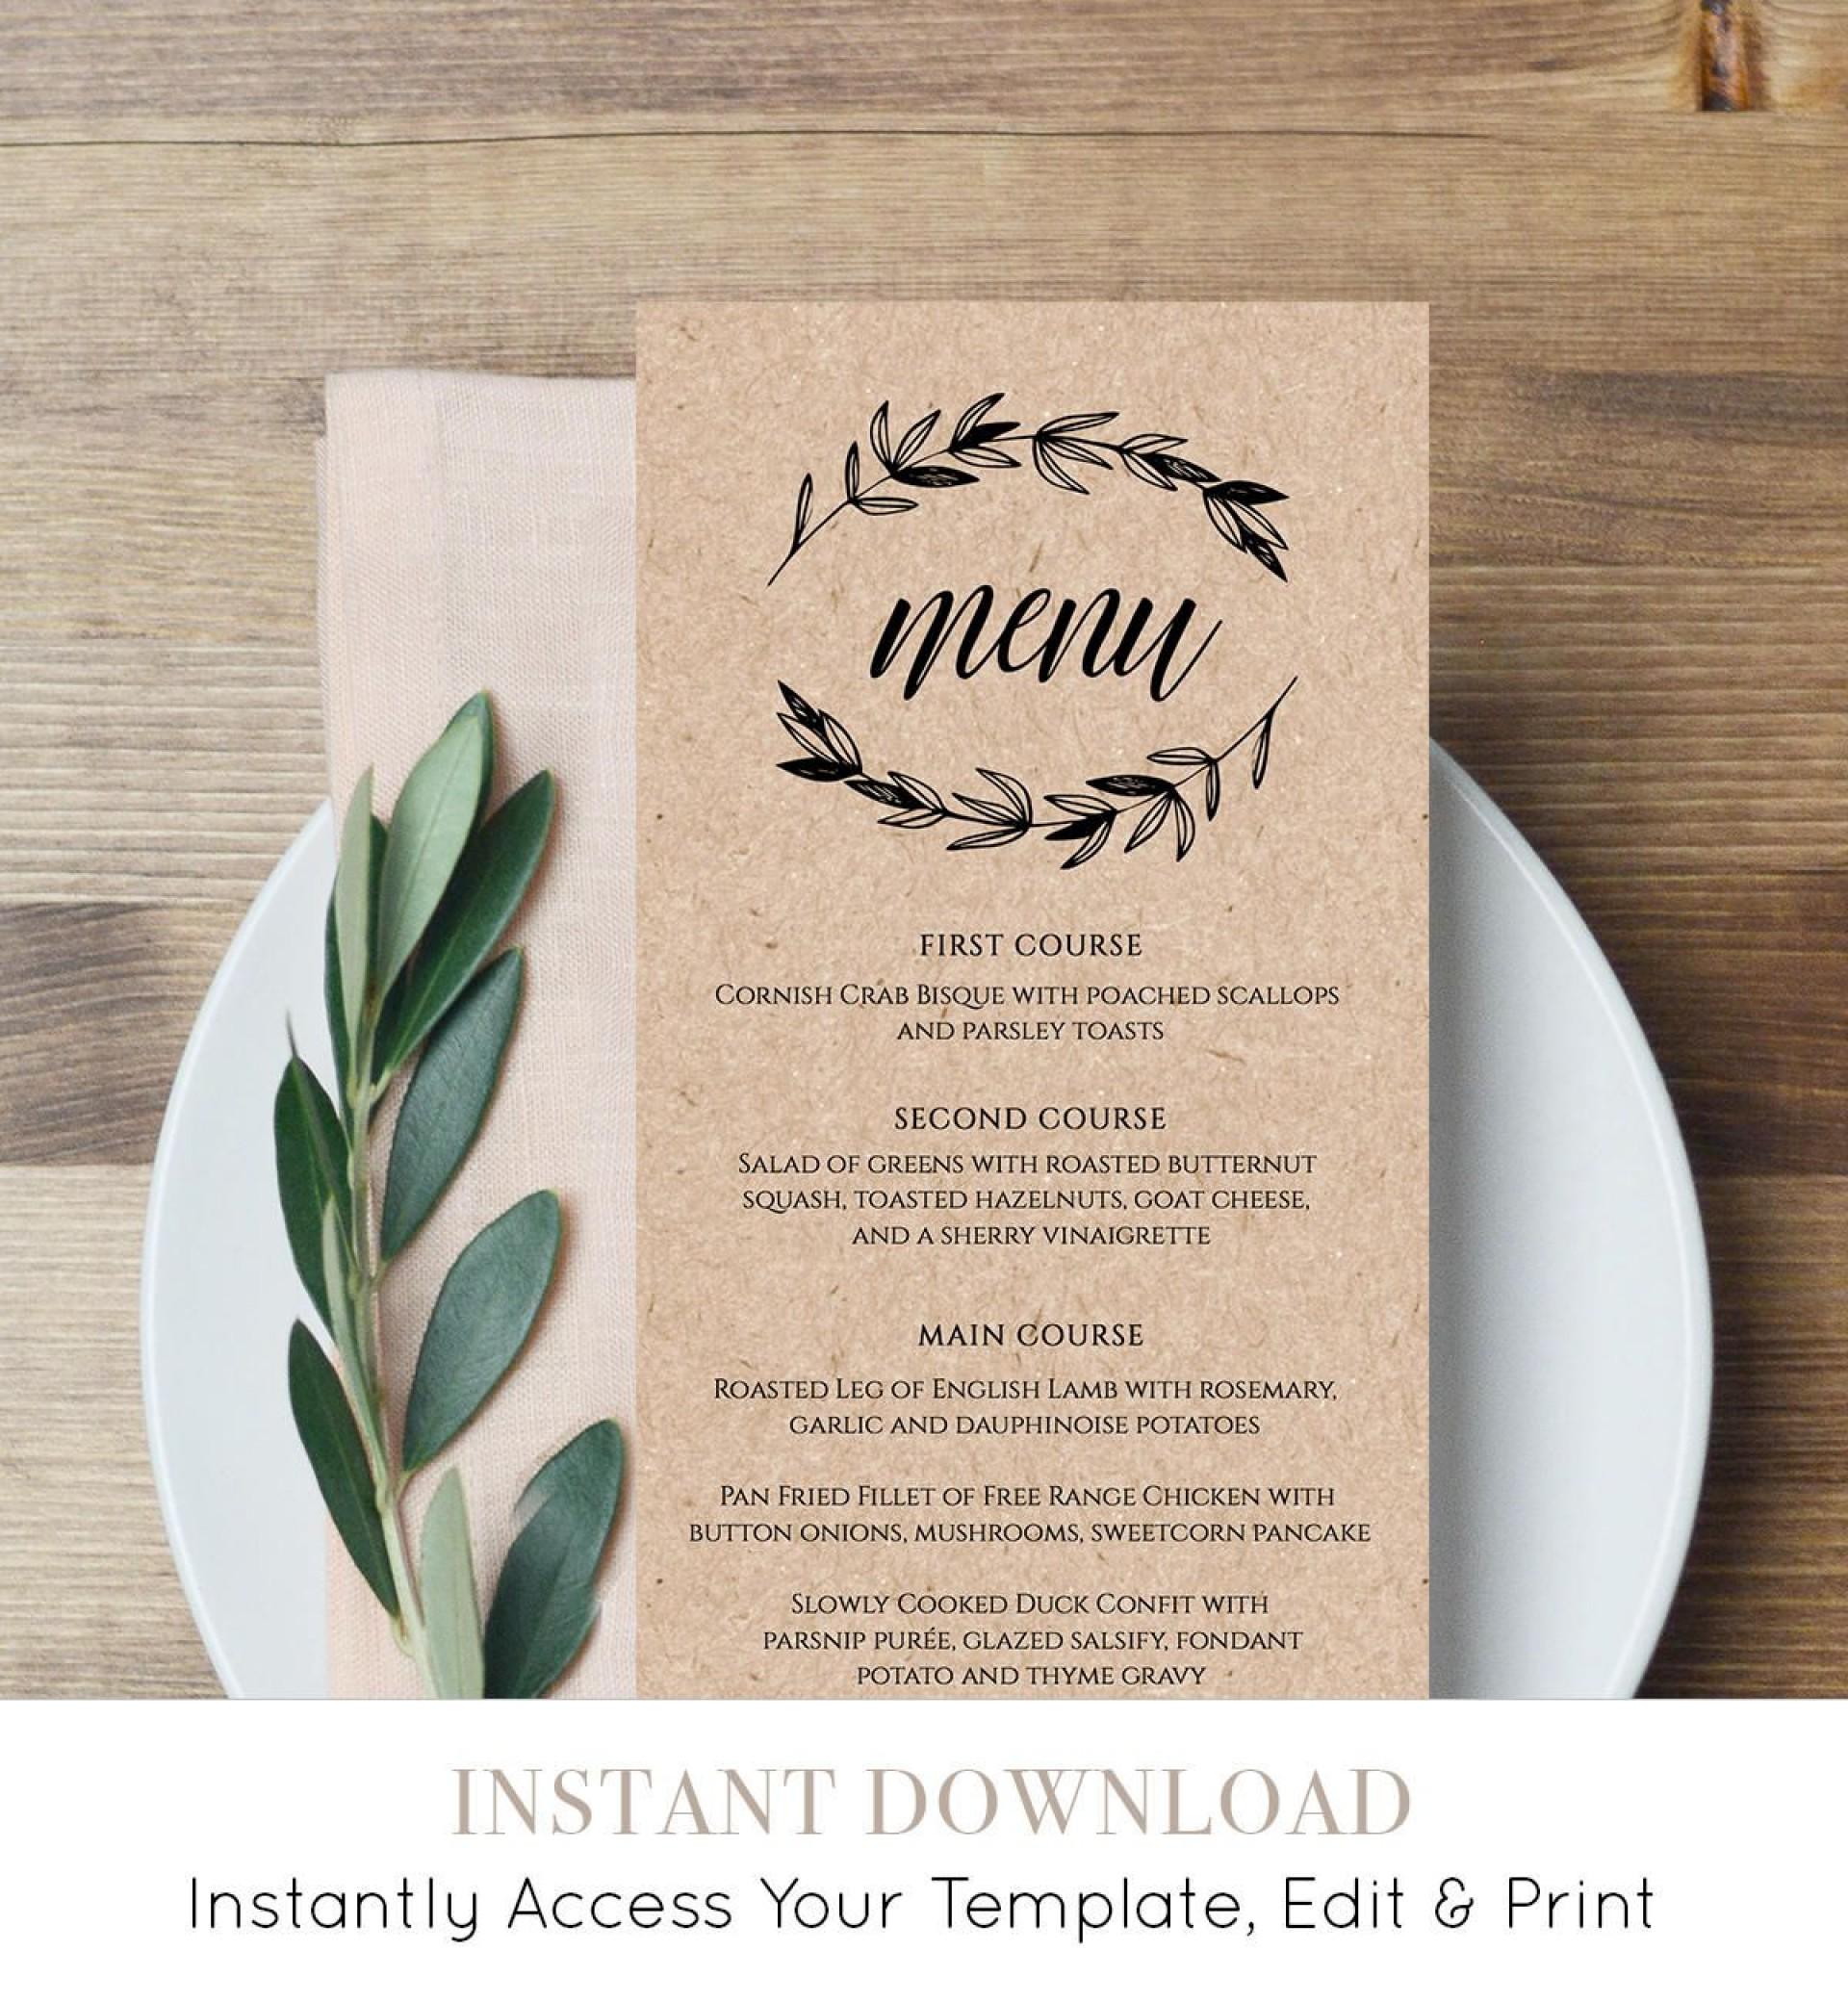 005 Marvelou Menu Card Template Free Download Example  Indian Restaurant Design Cafe1920